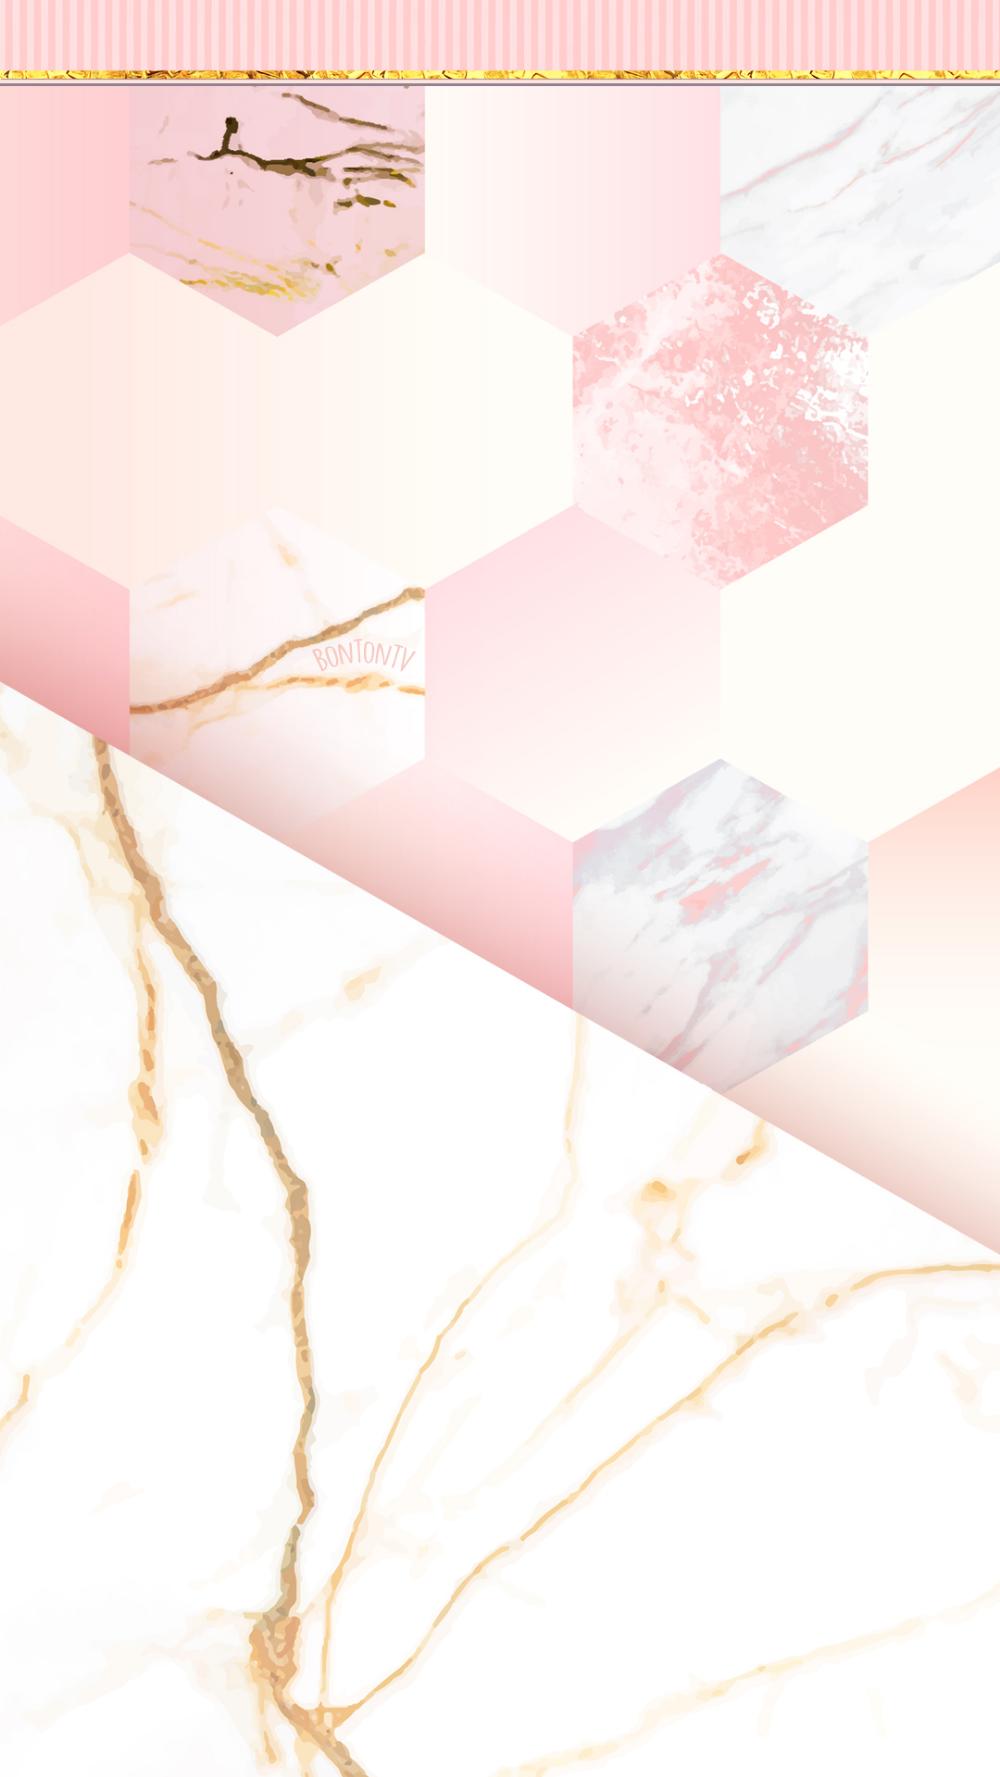 Get Good Marble Phone Wallpaper HD 2020 by bontontv.com